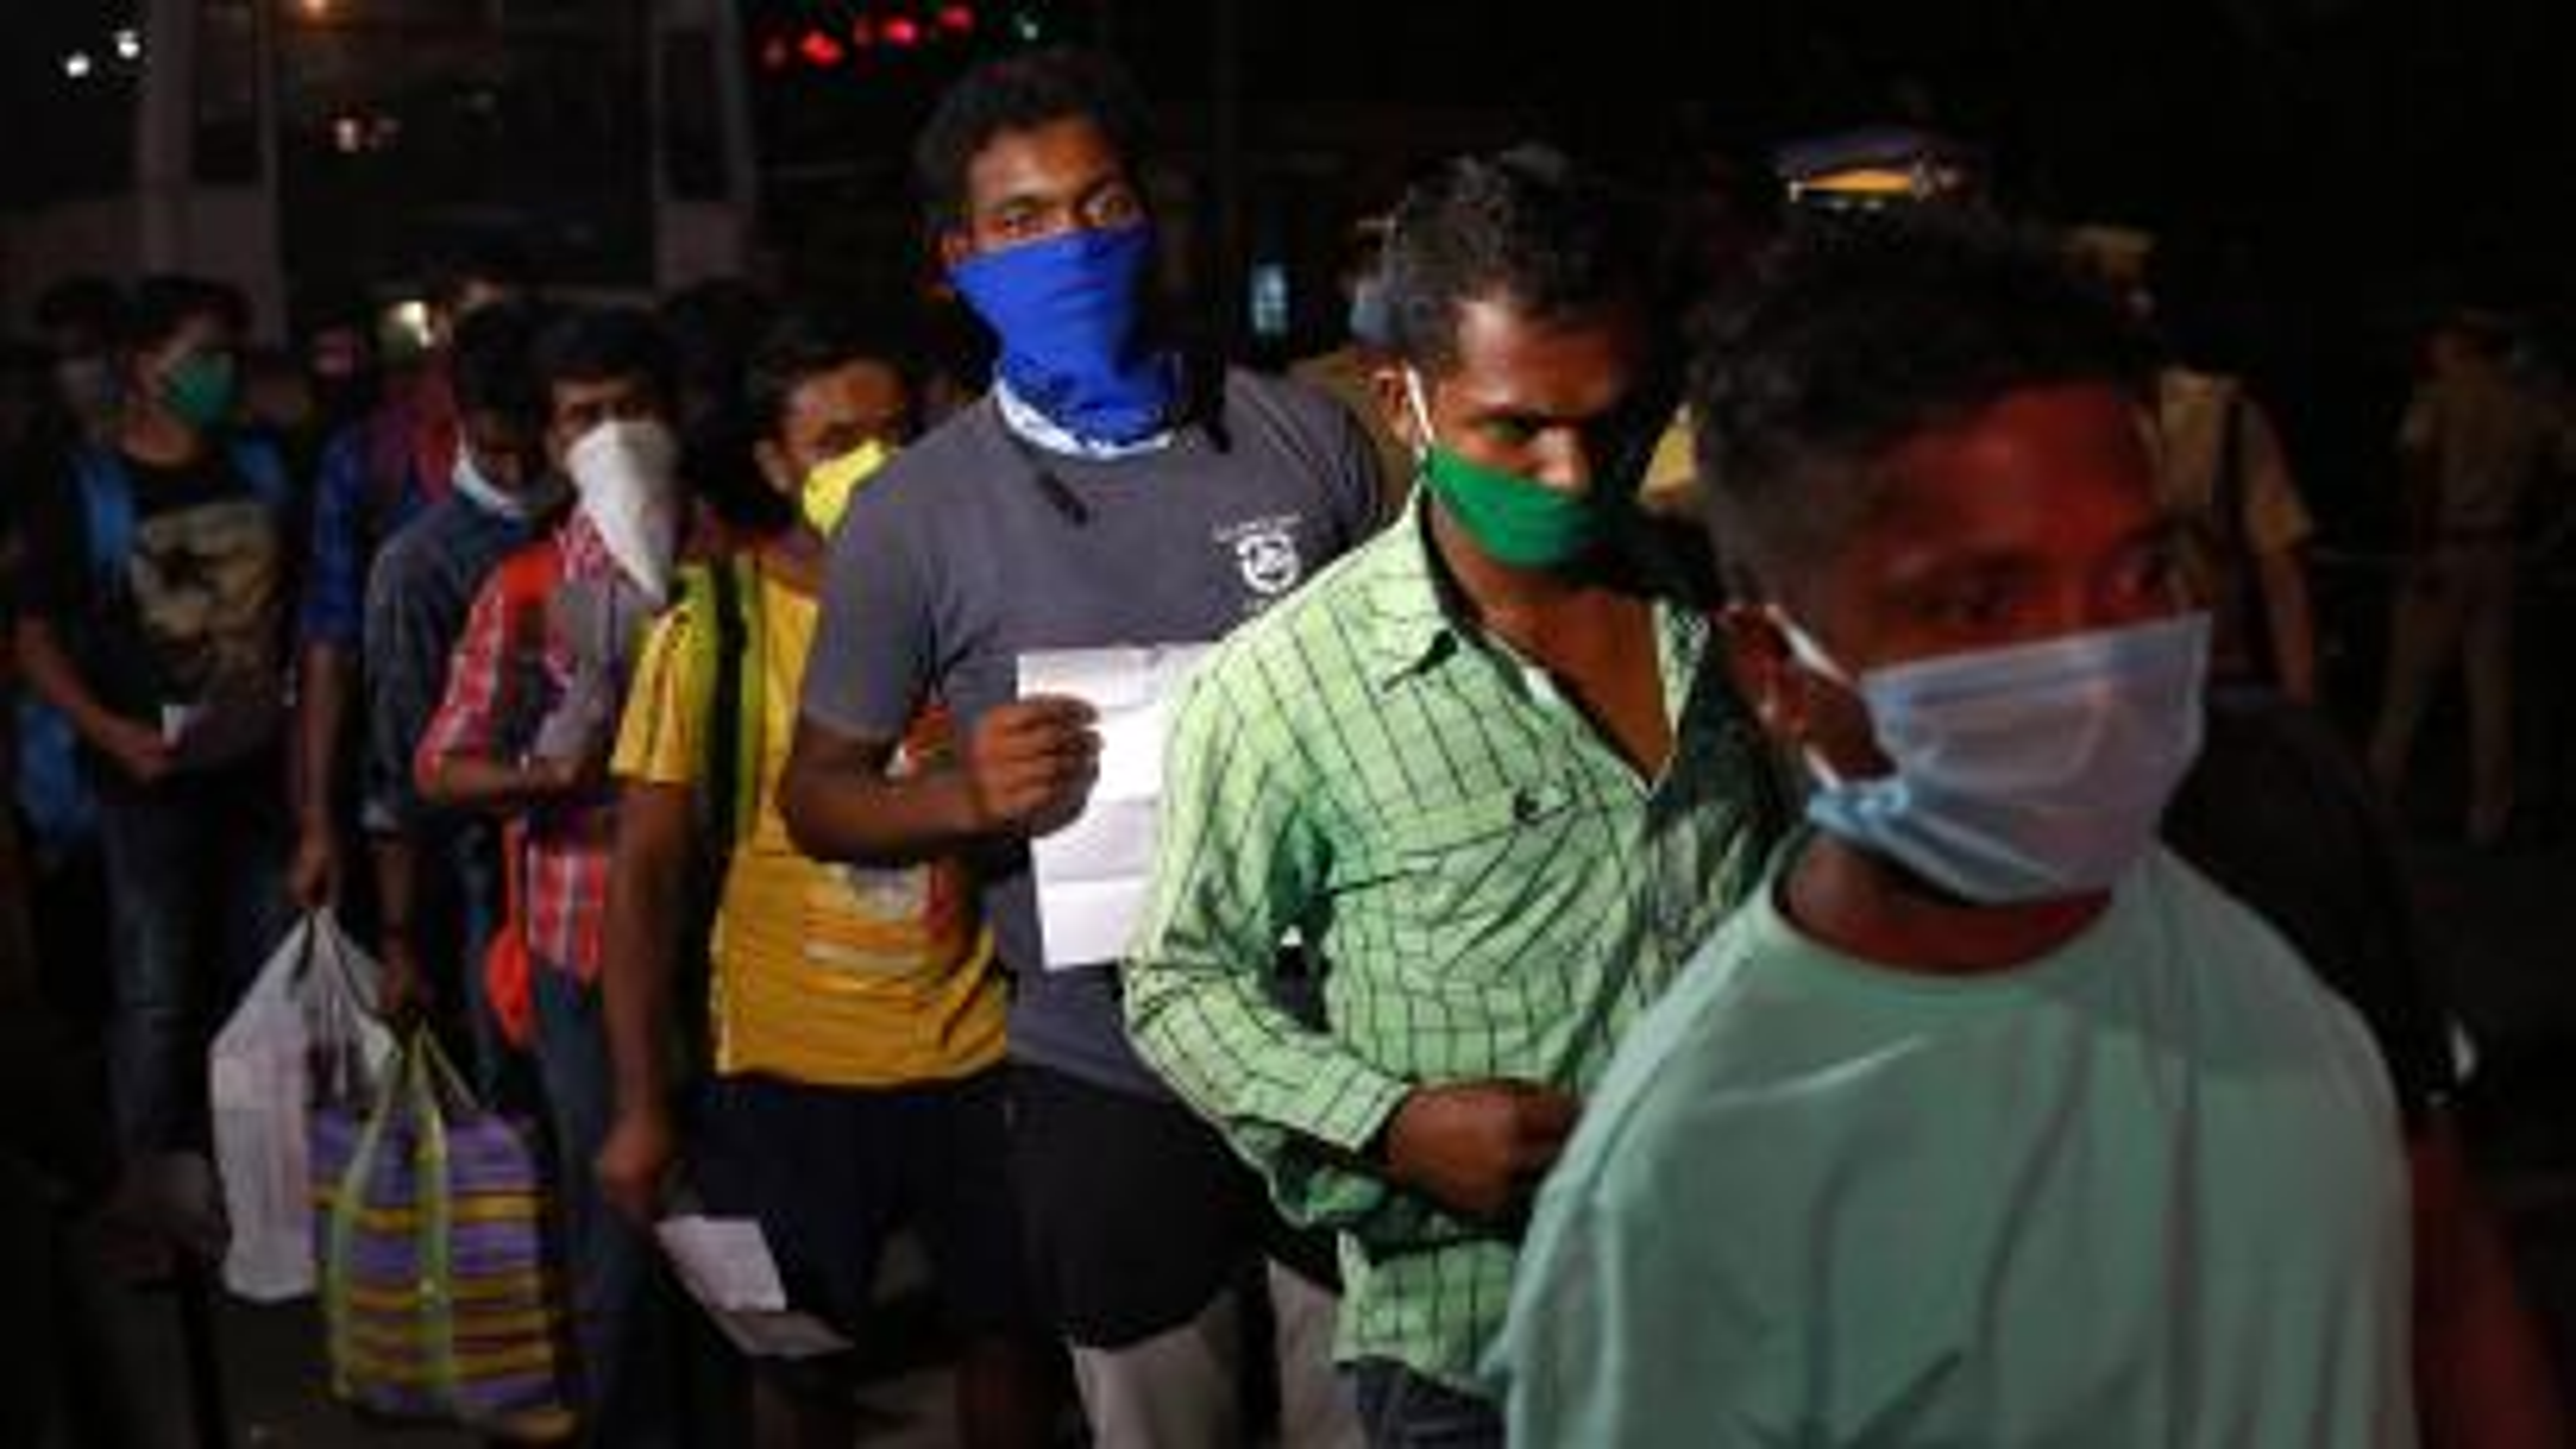 Outbreak of coronavirus disease (COVID-19) in Kochi